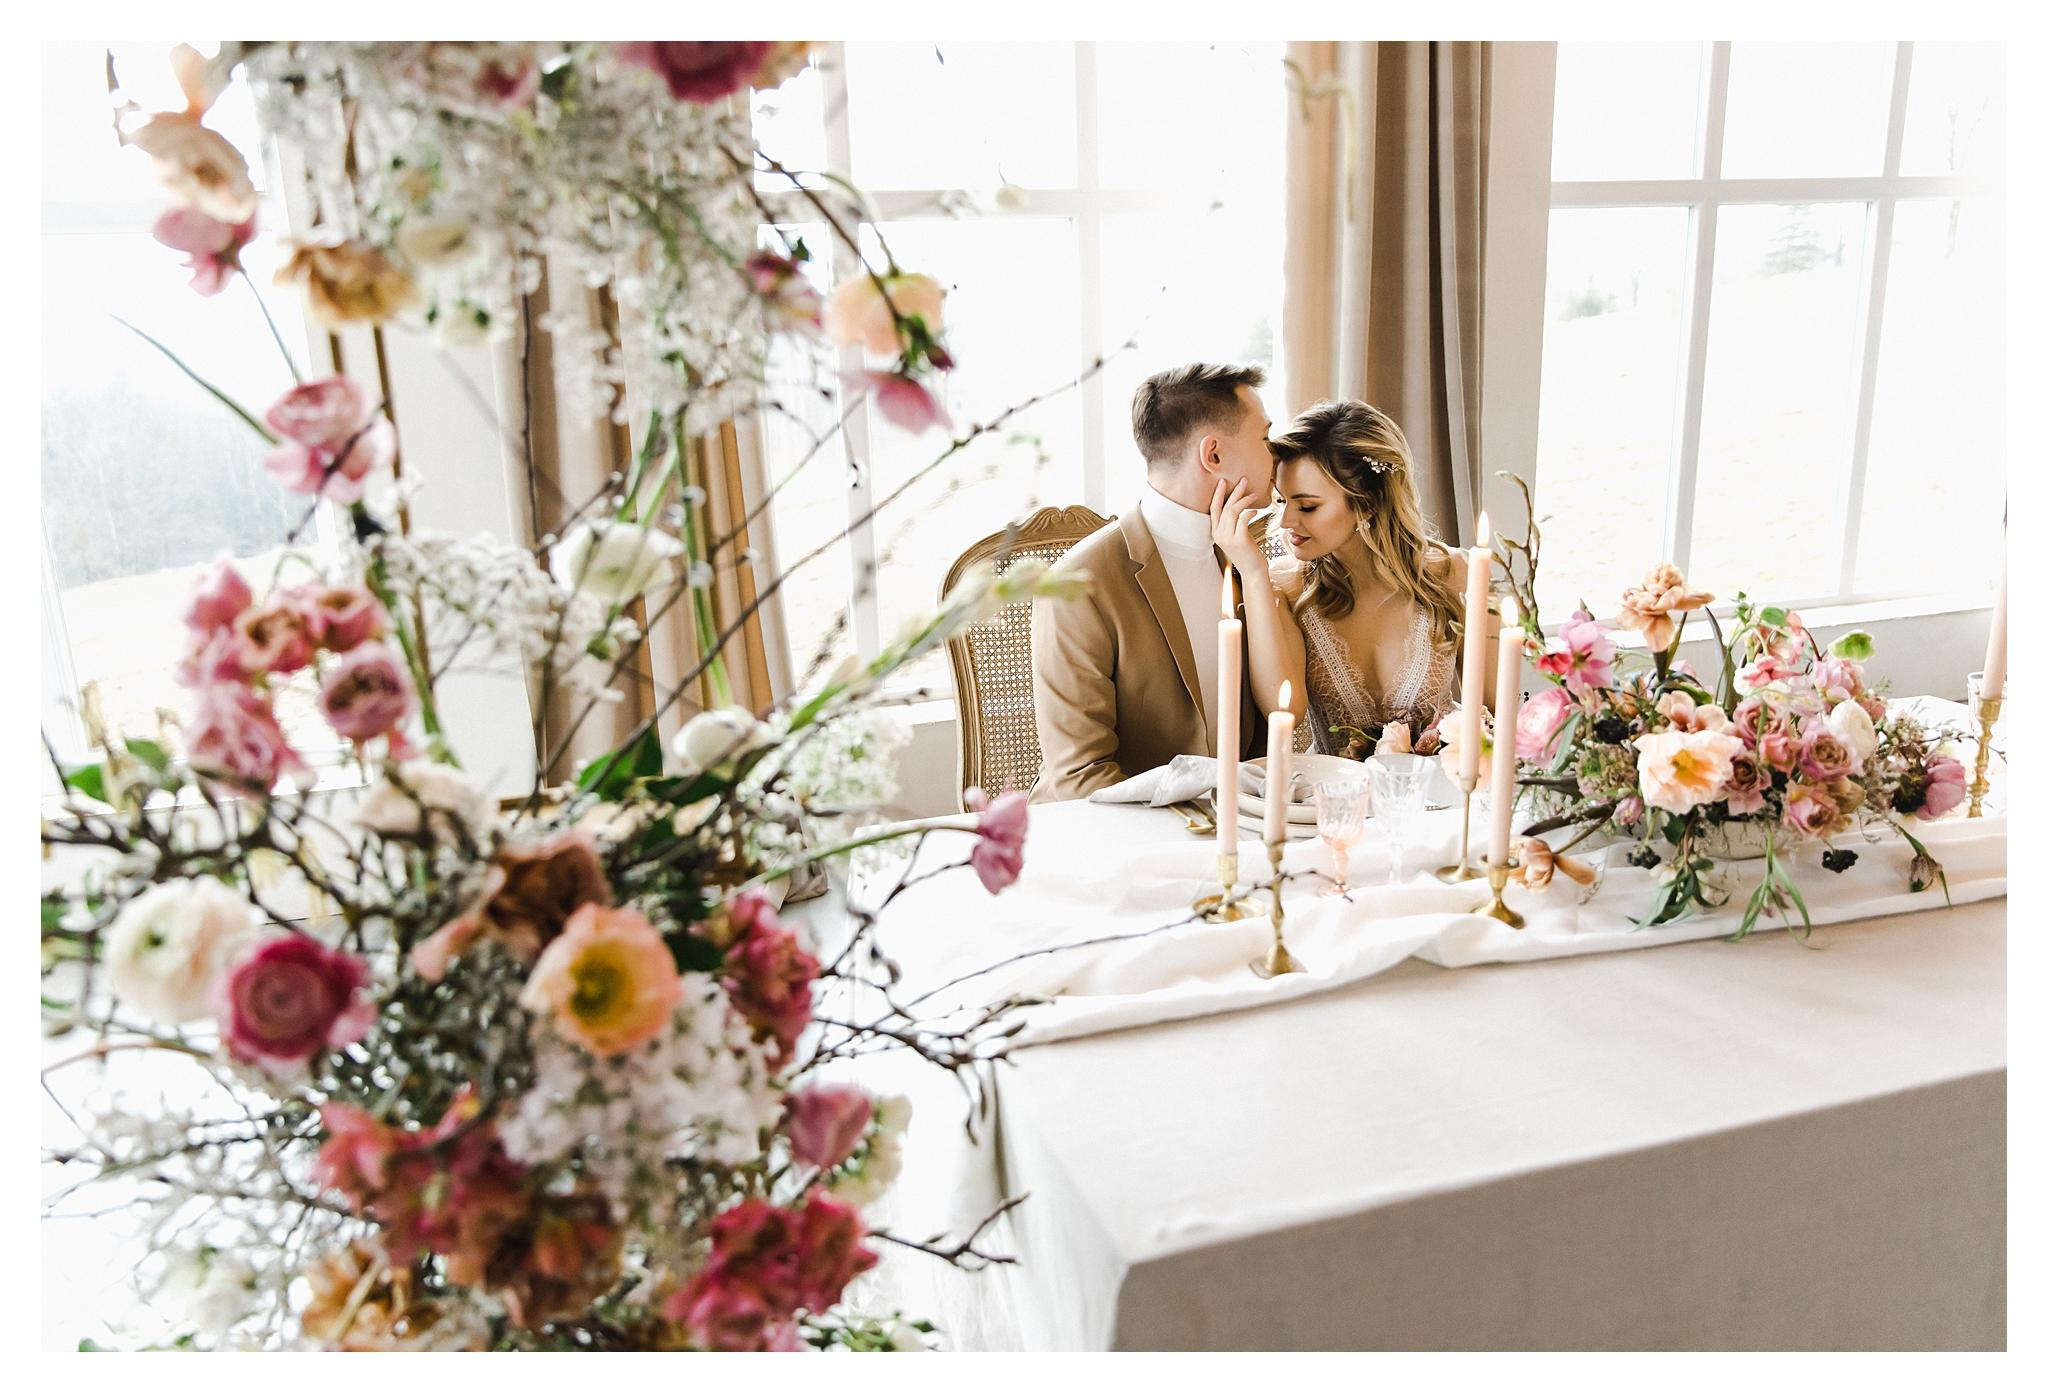 Bride Side Wedding Planner